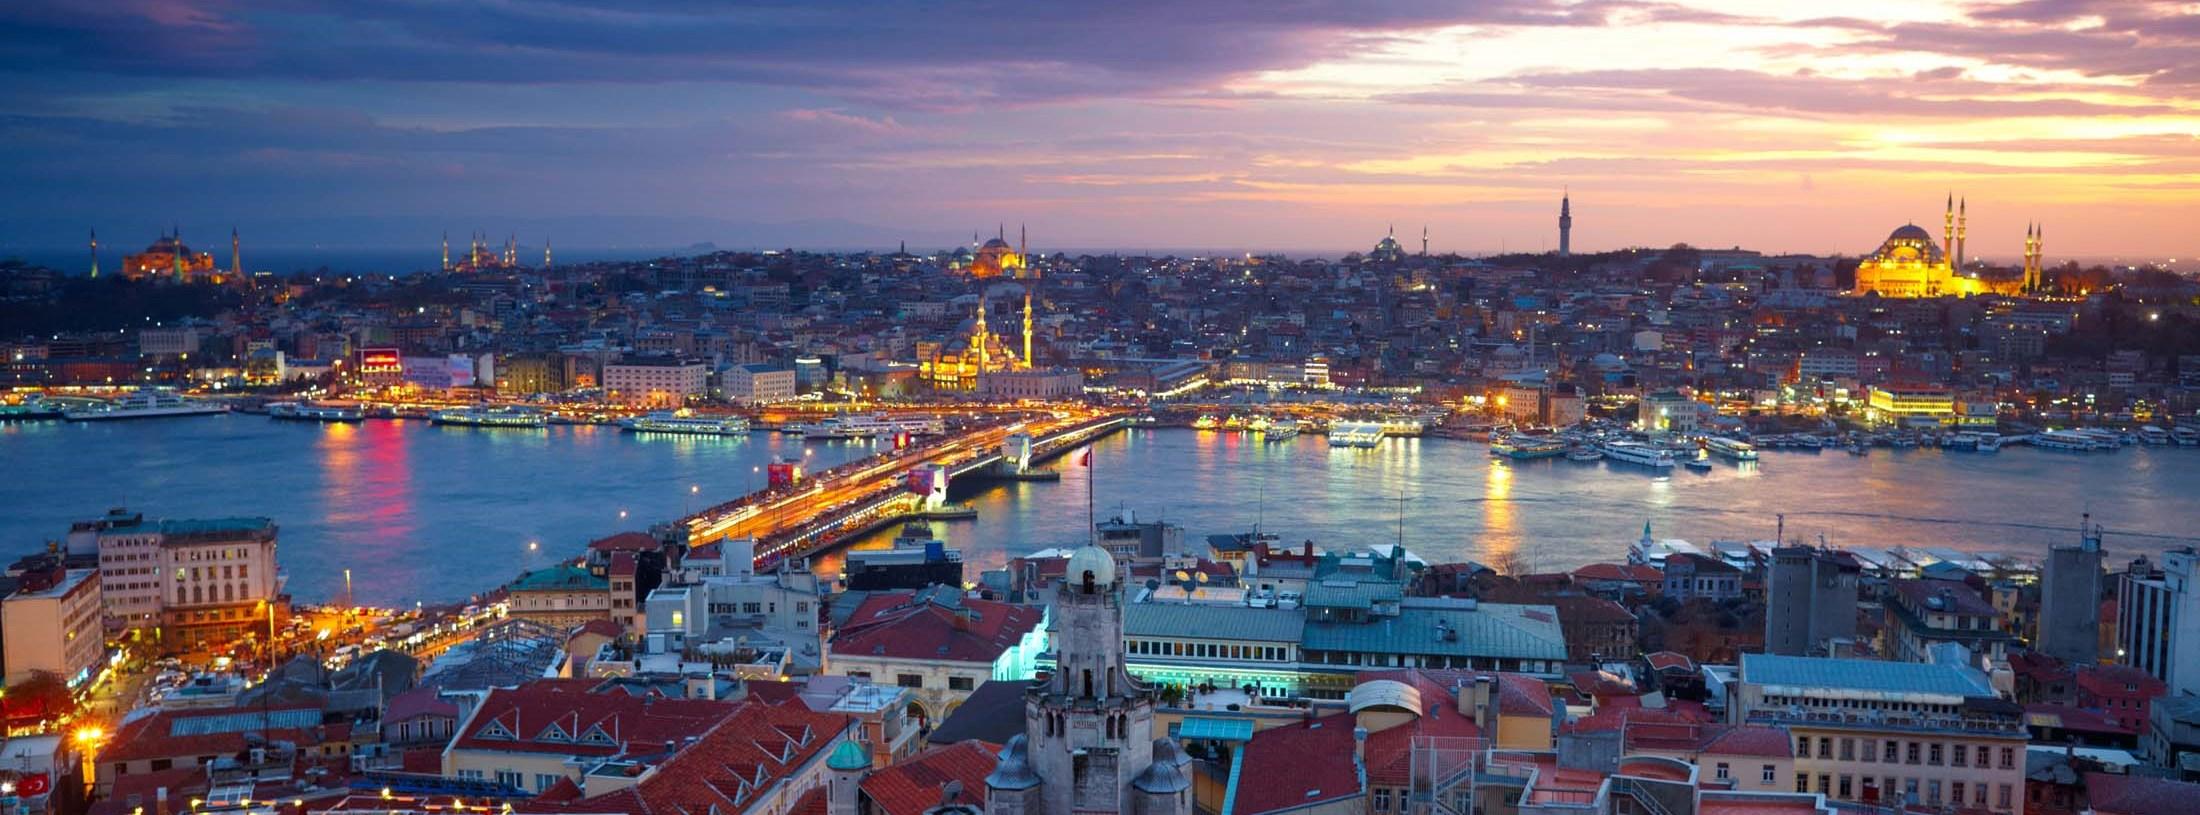 İstanbul Bakırköy Otelleri